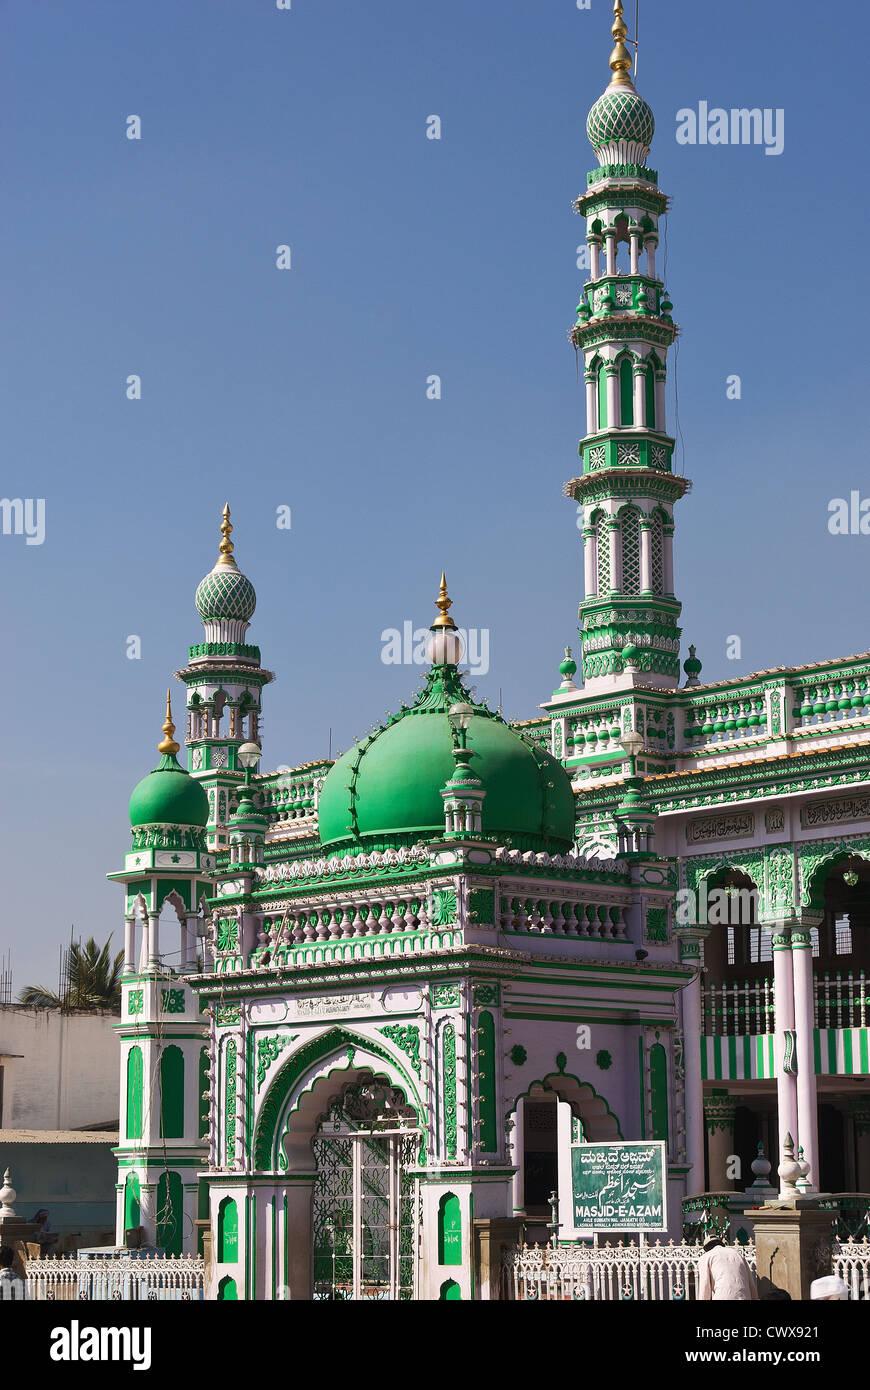 Elk201-2159v India, Karnataka, Mysore, Masjid E Azam mosque - Stock Image